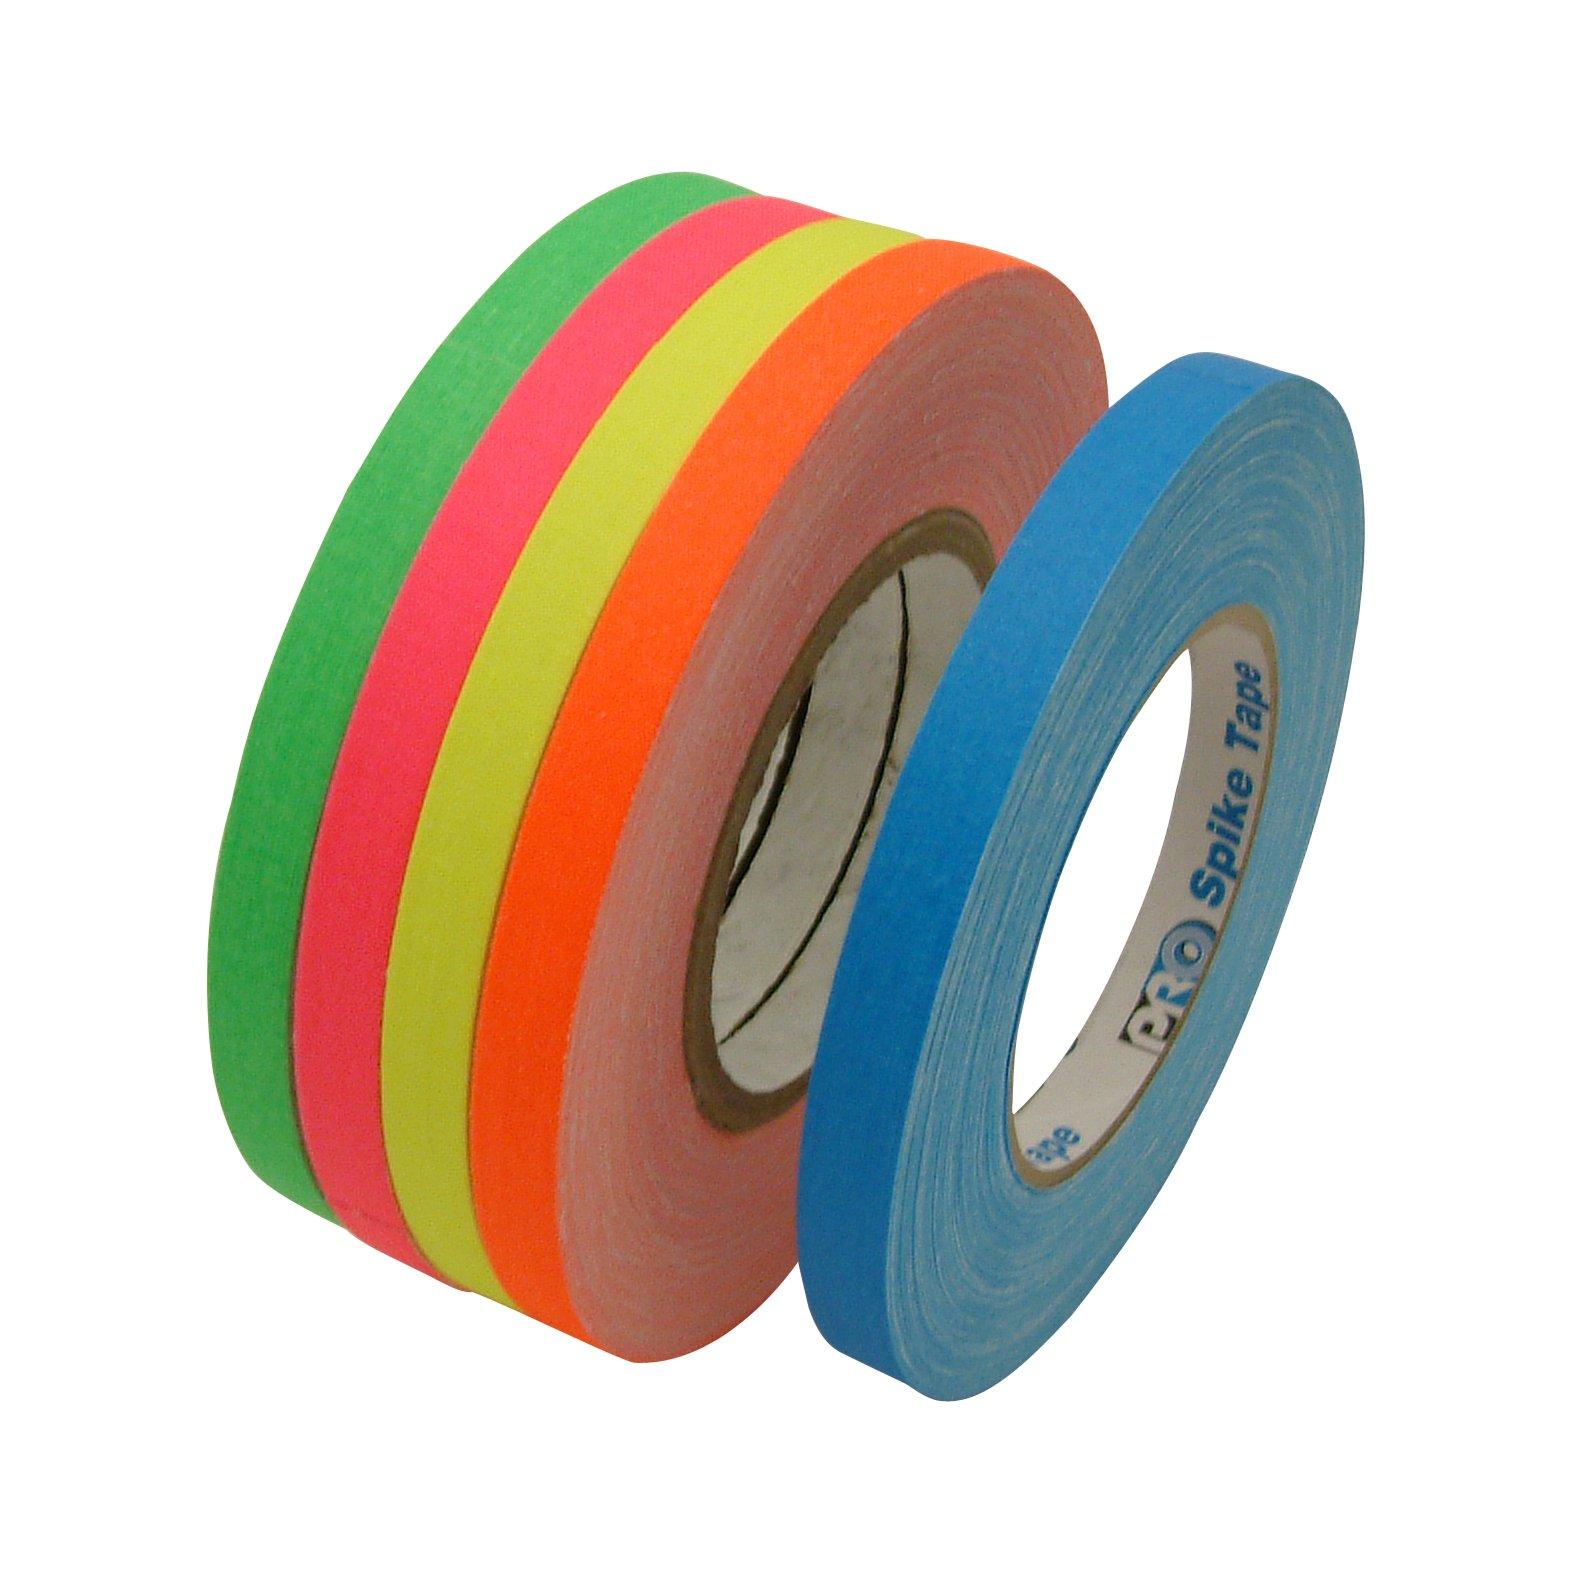 JVCC Gaff-Color-Pack Gaffers Tape Multi-Pack: 1/2 in. wide 5 Rolls/Pack (Fluorescent Blue, Fl. Green, Fl. Orange, Fl. Pink, Fl. Yellow) by J.V. Converting